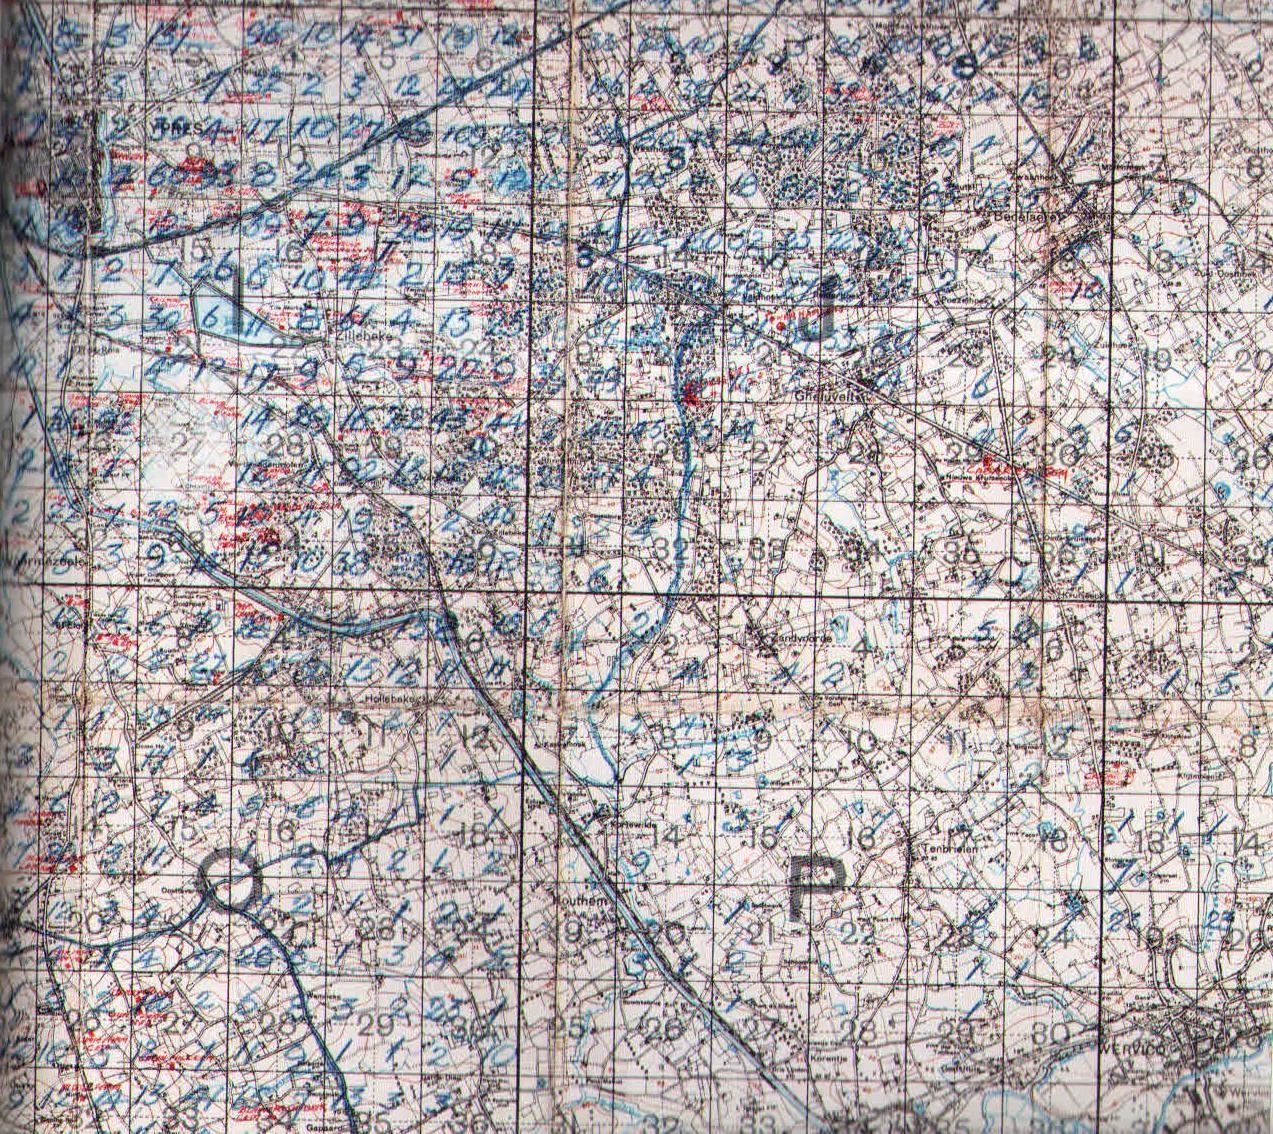 war_mapping_1.jpg